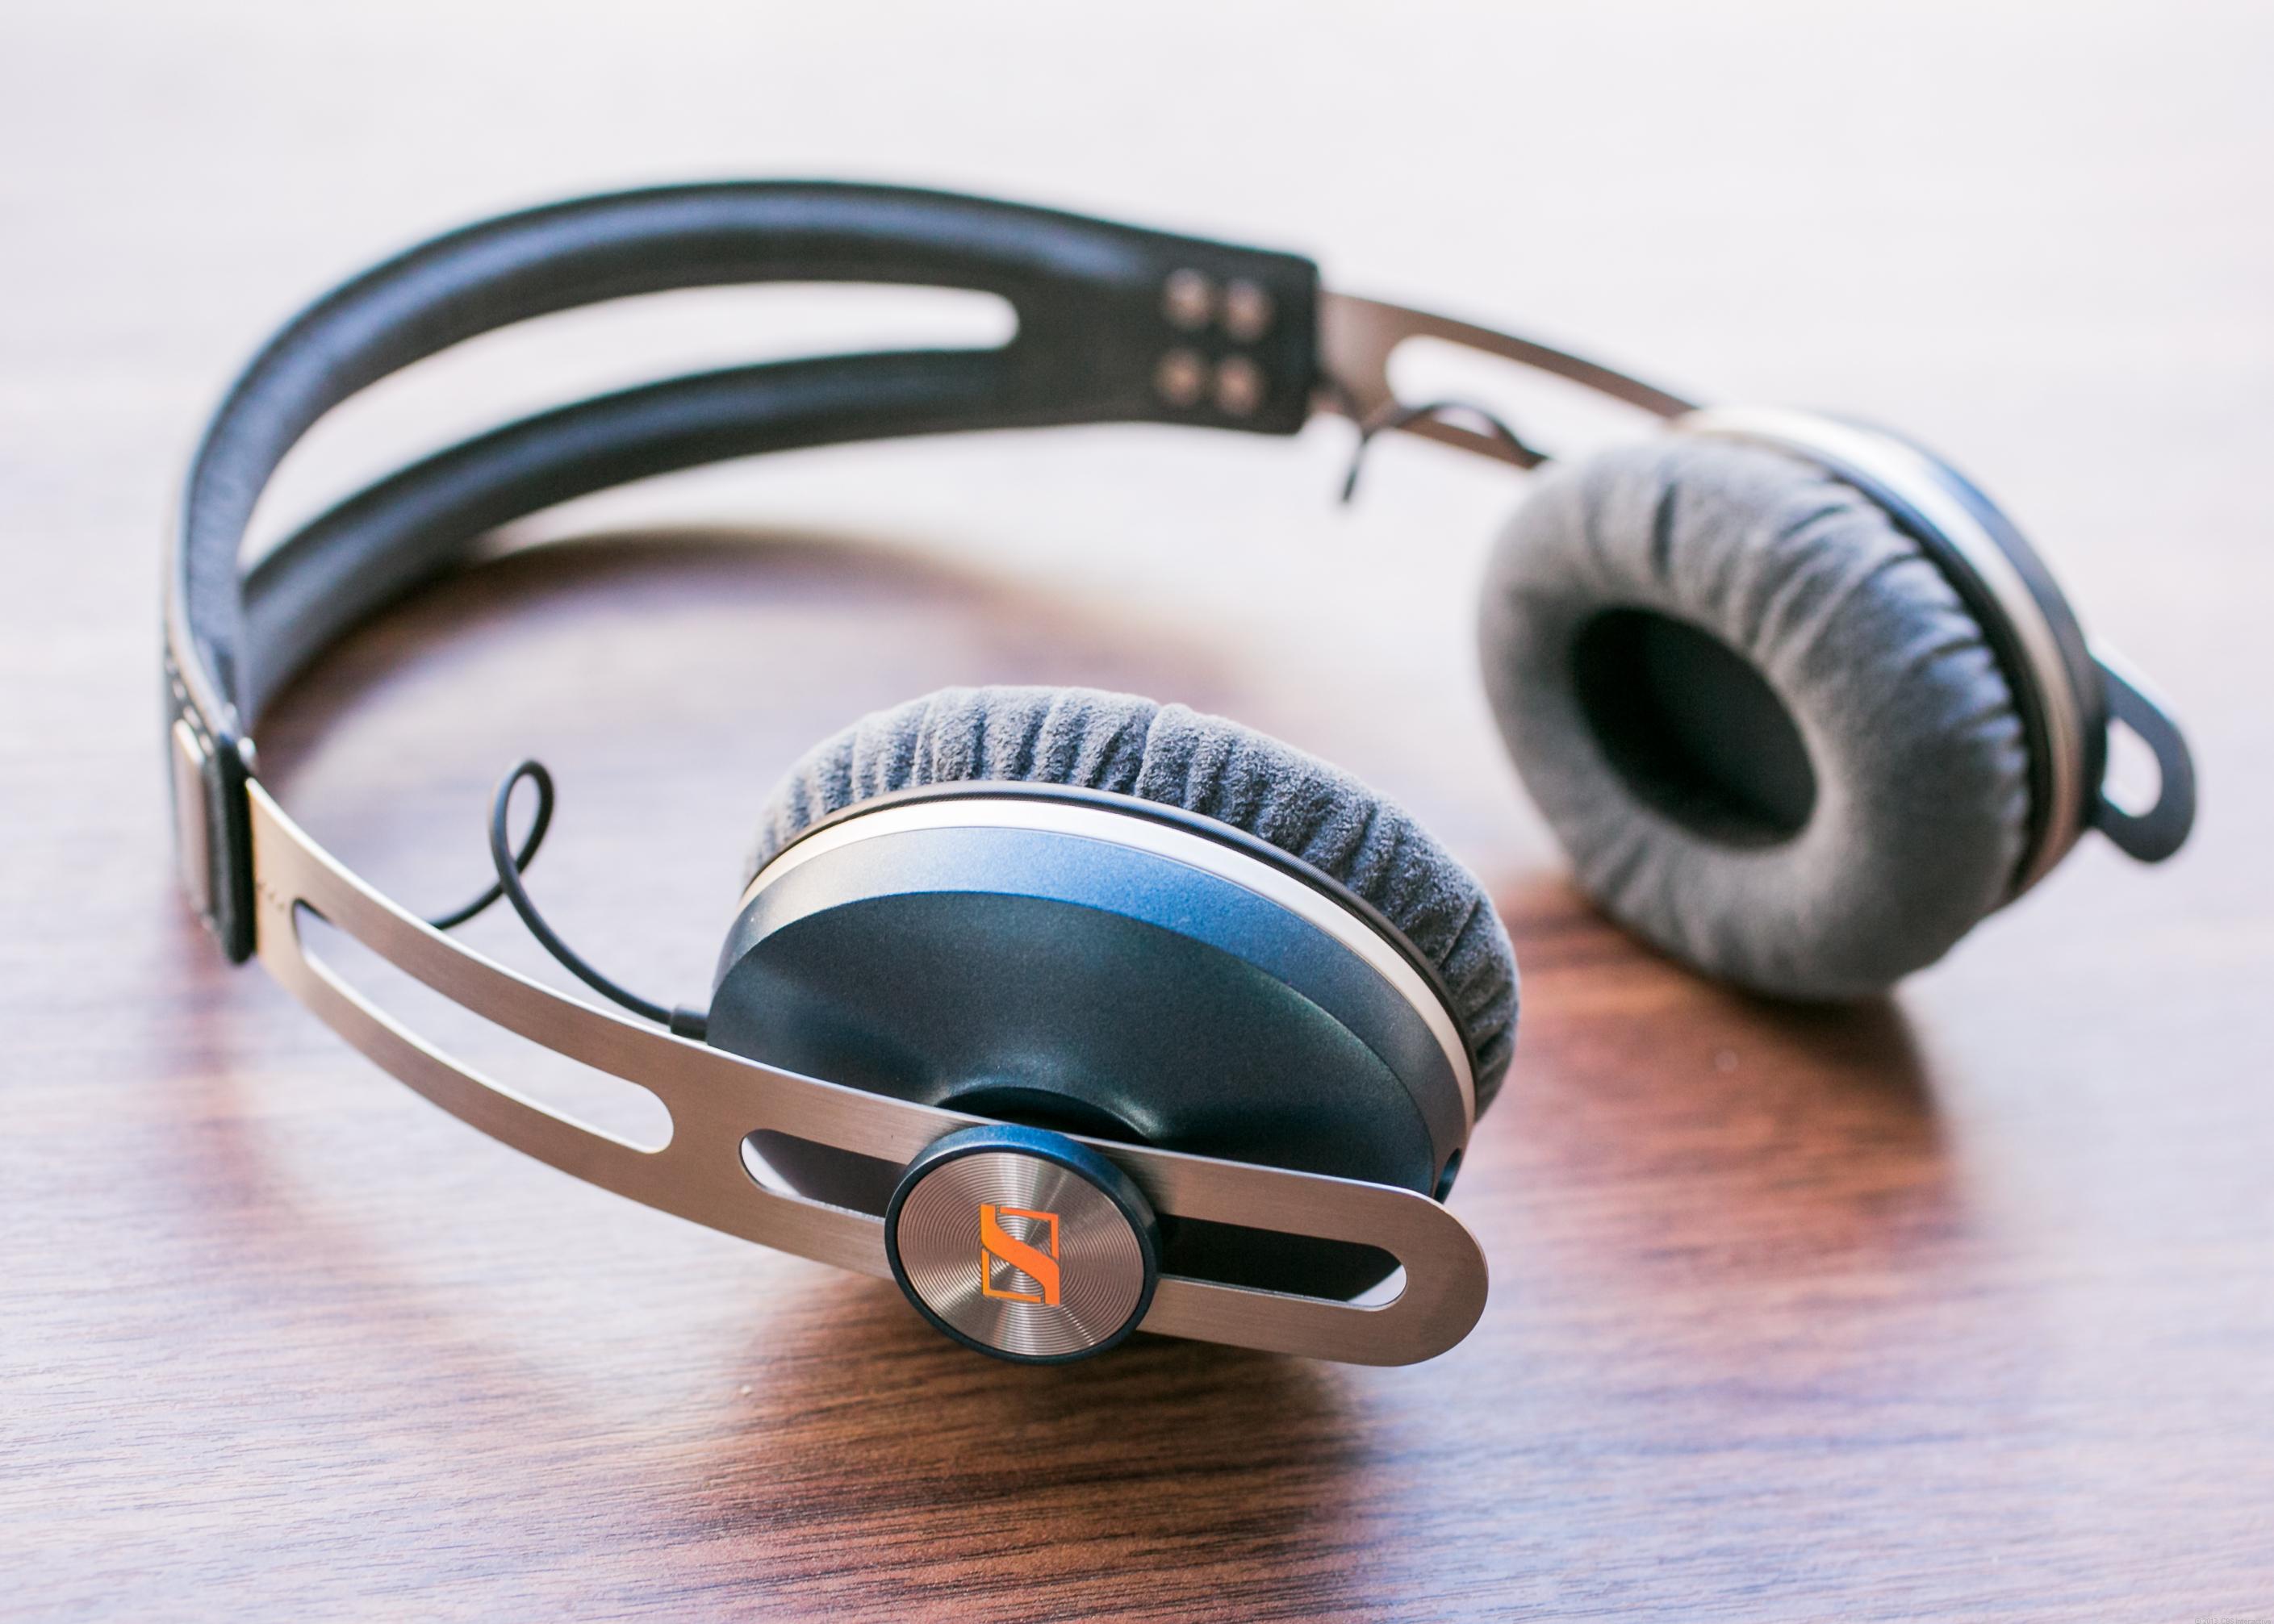 Beats earphones charger - sennheiser earphones momentum